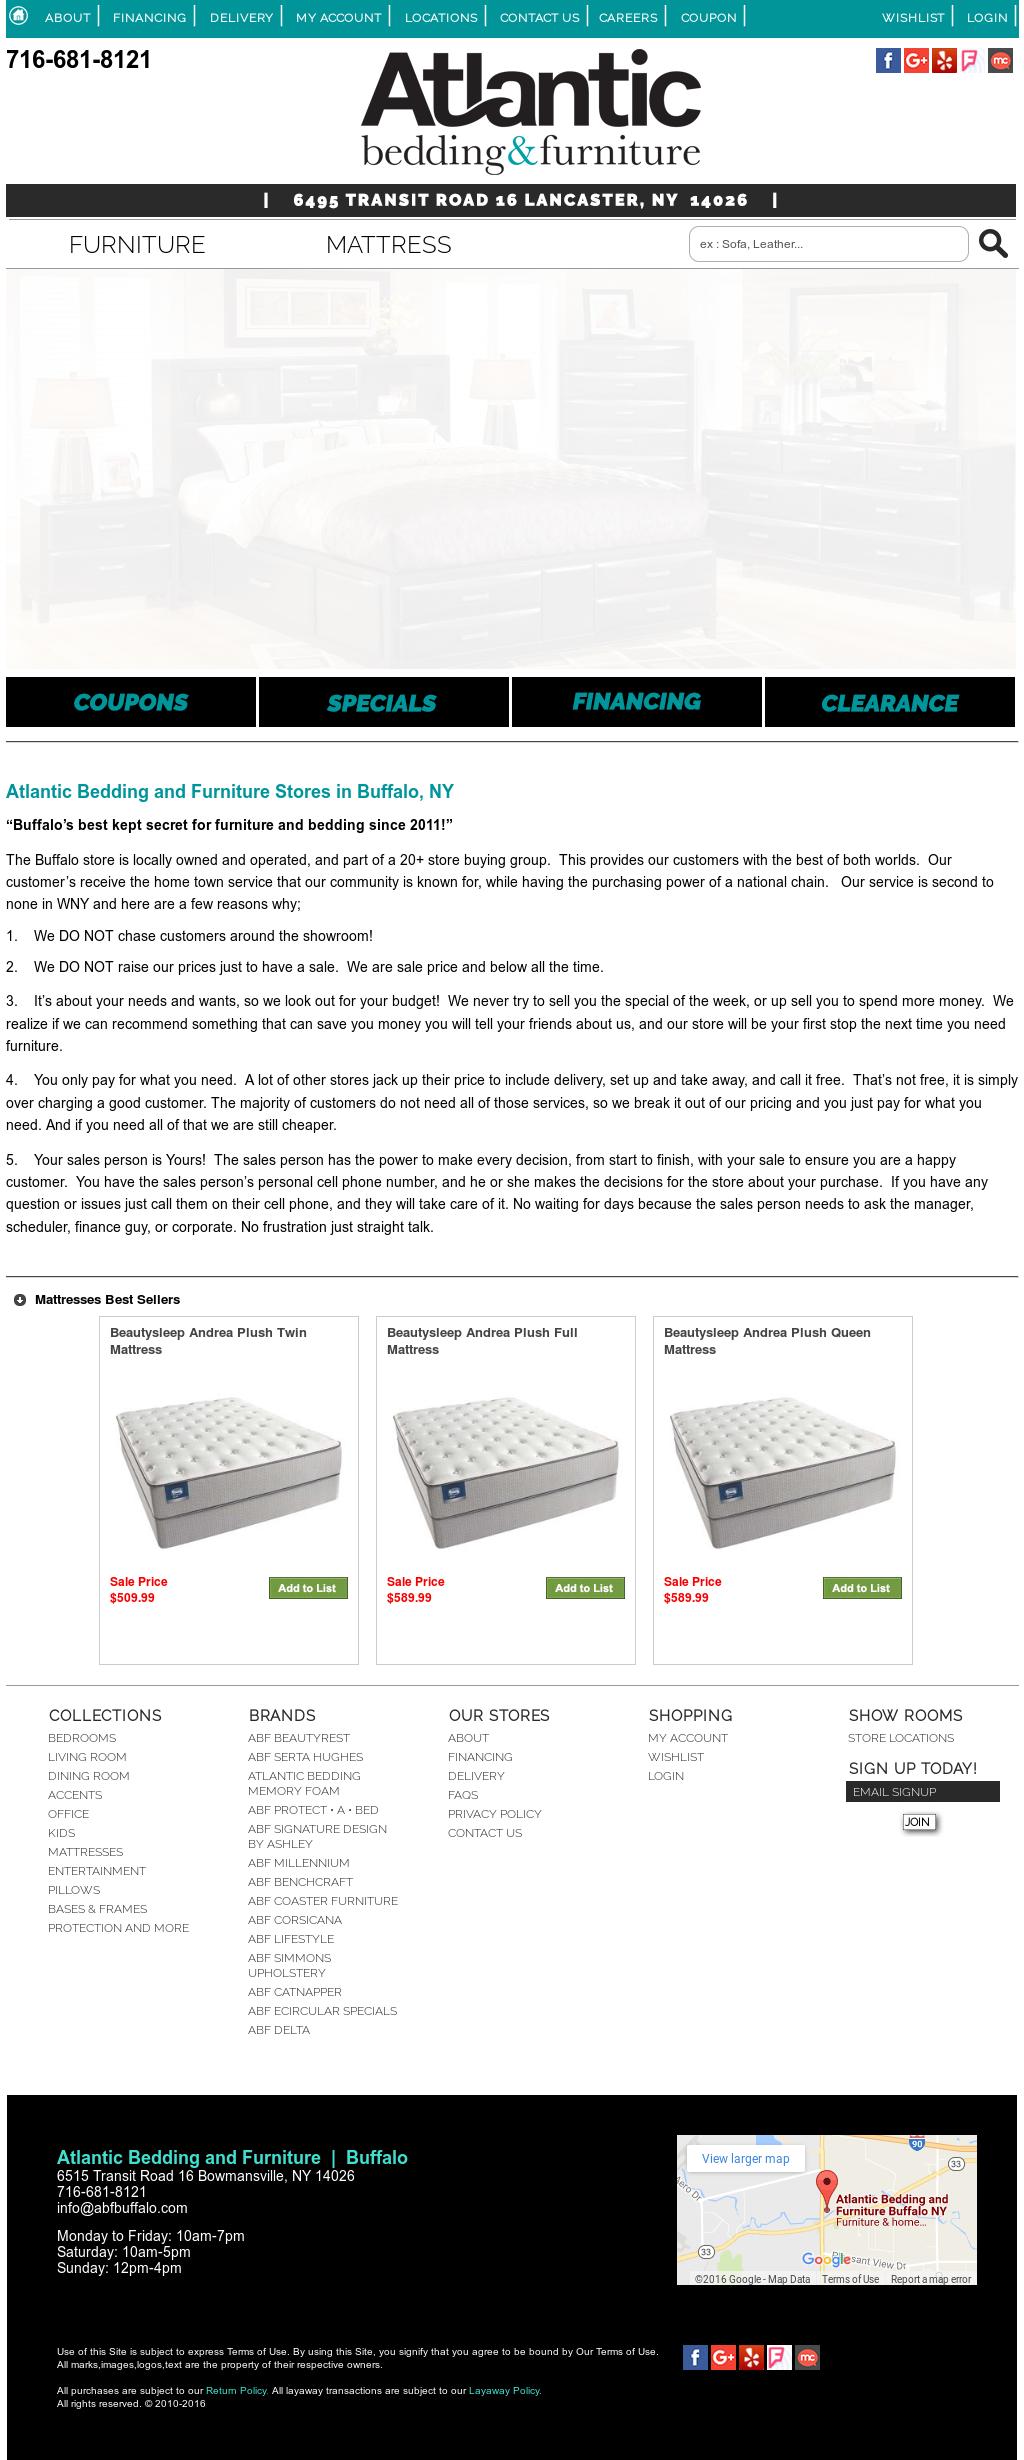 Atlantic Bedding And Furniture Buffalo Ny Competitors Revenue And